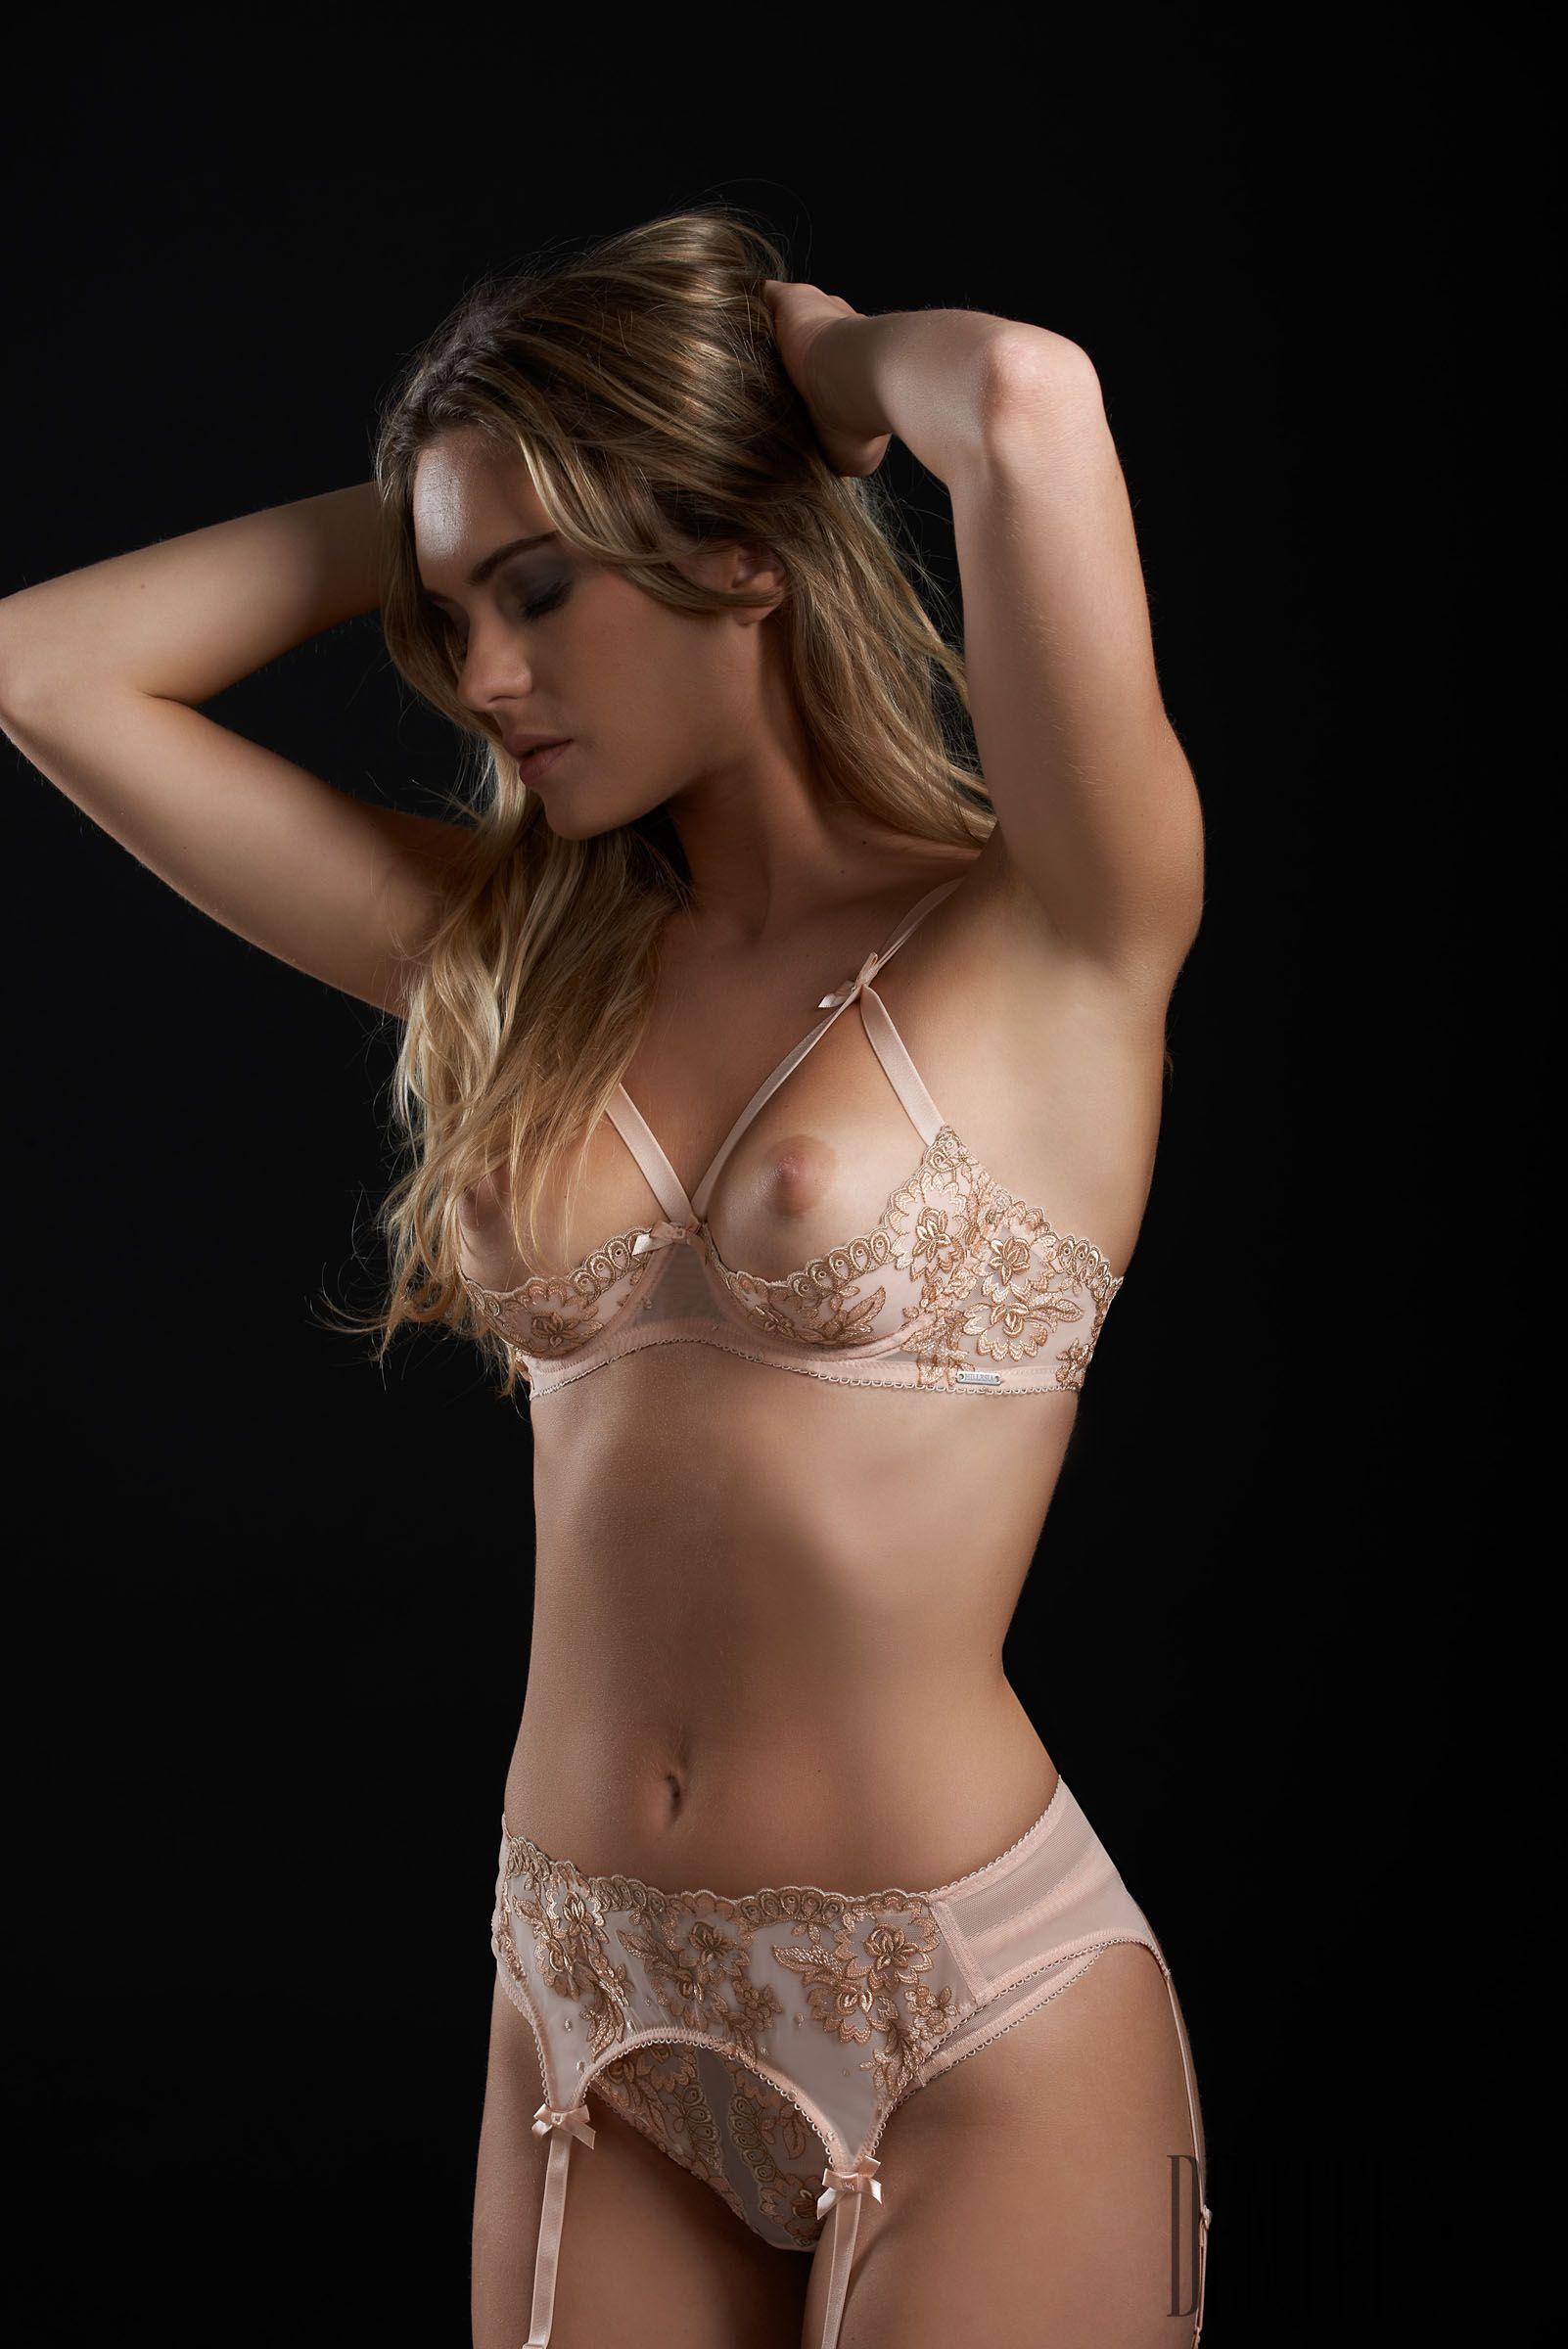 Petra model bikini pics